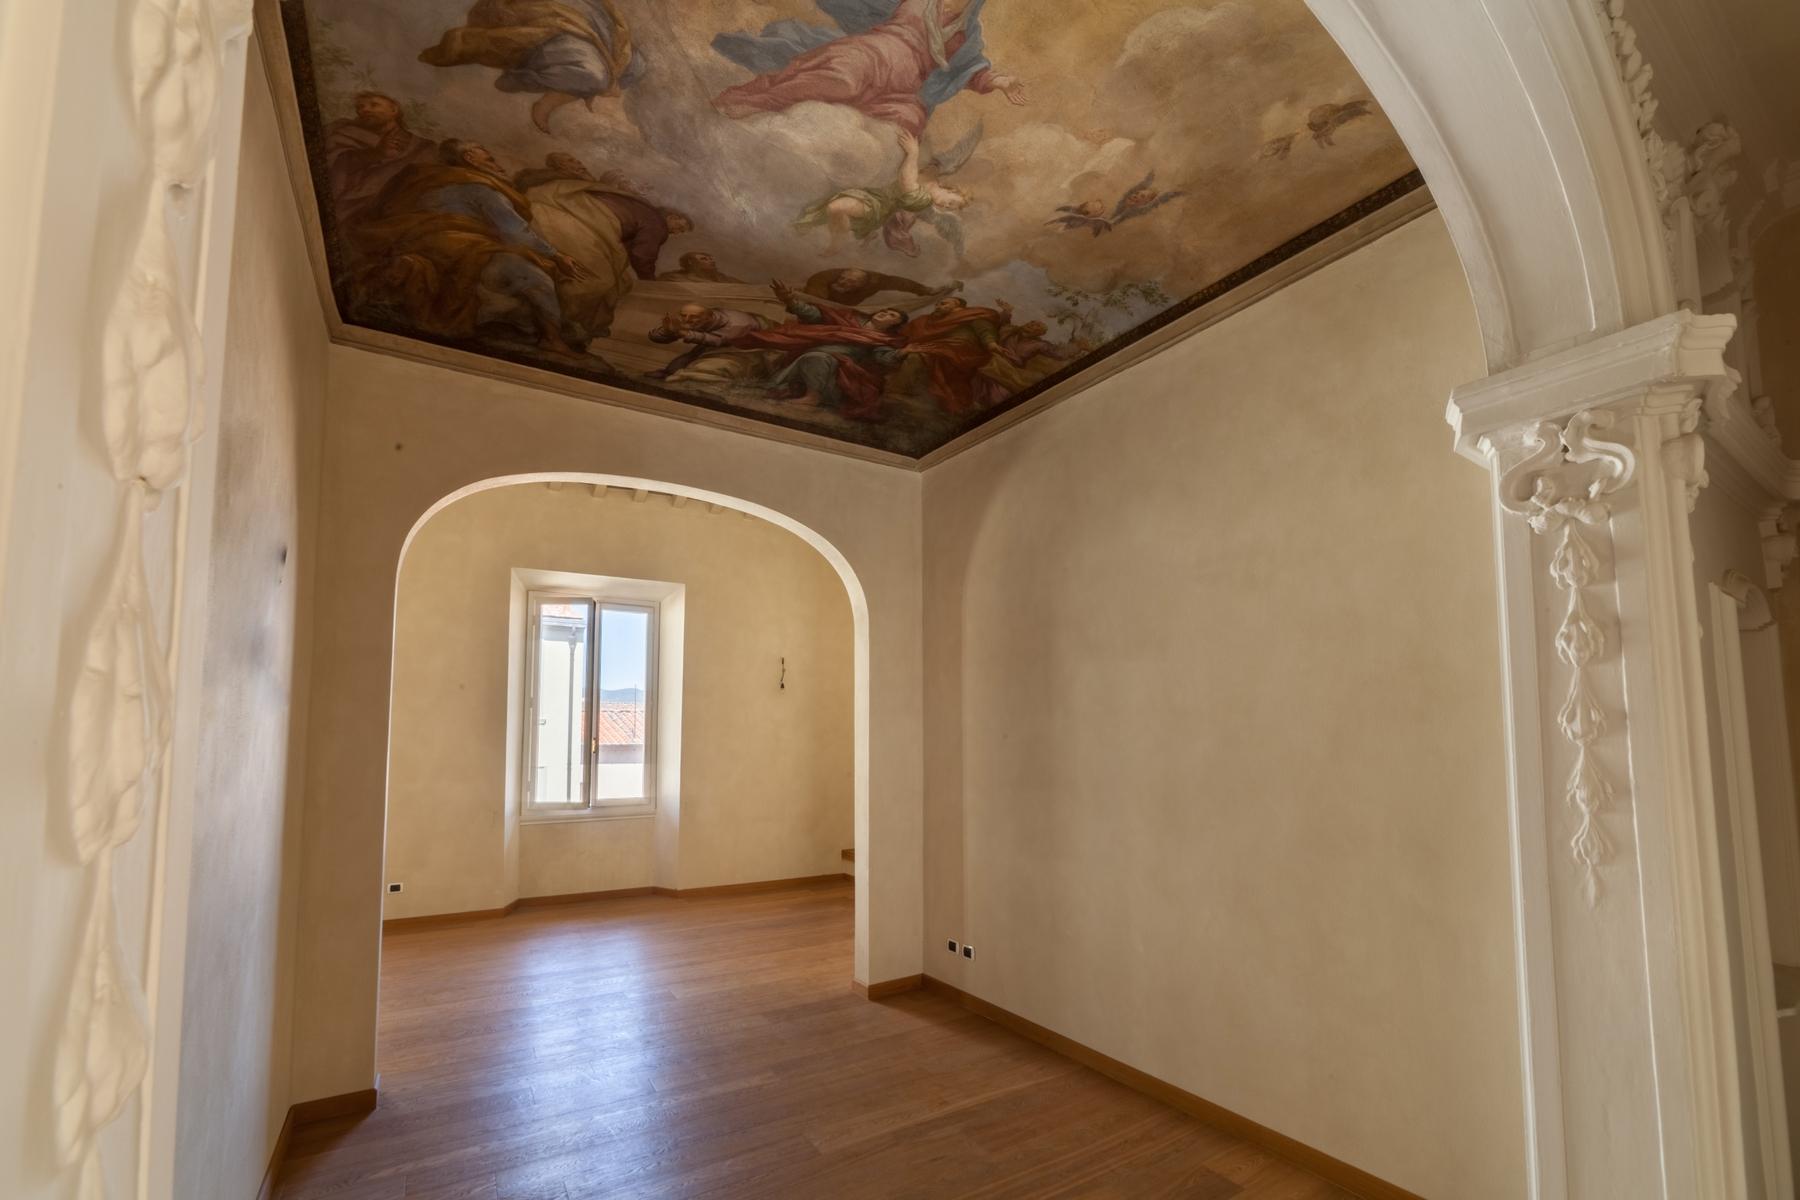 Attico in Vendita a Firenze: 5 locali, 180 mq - Foto 4